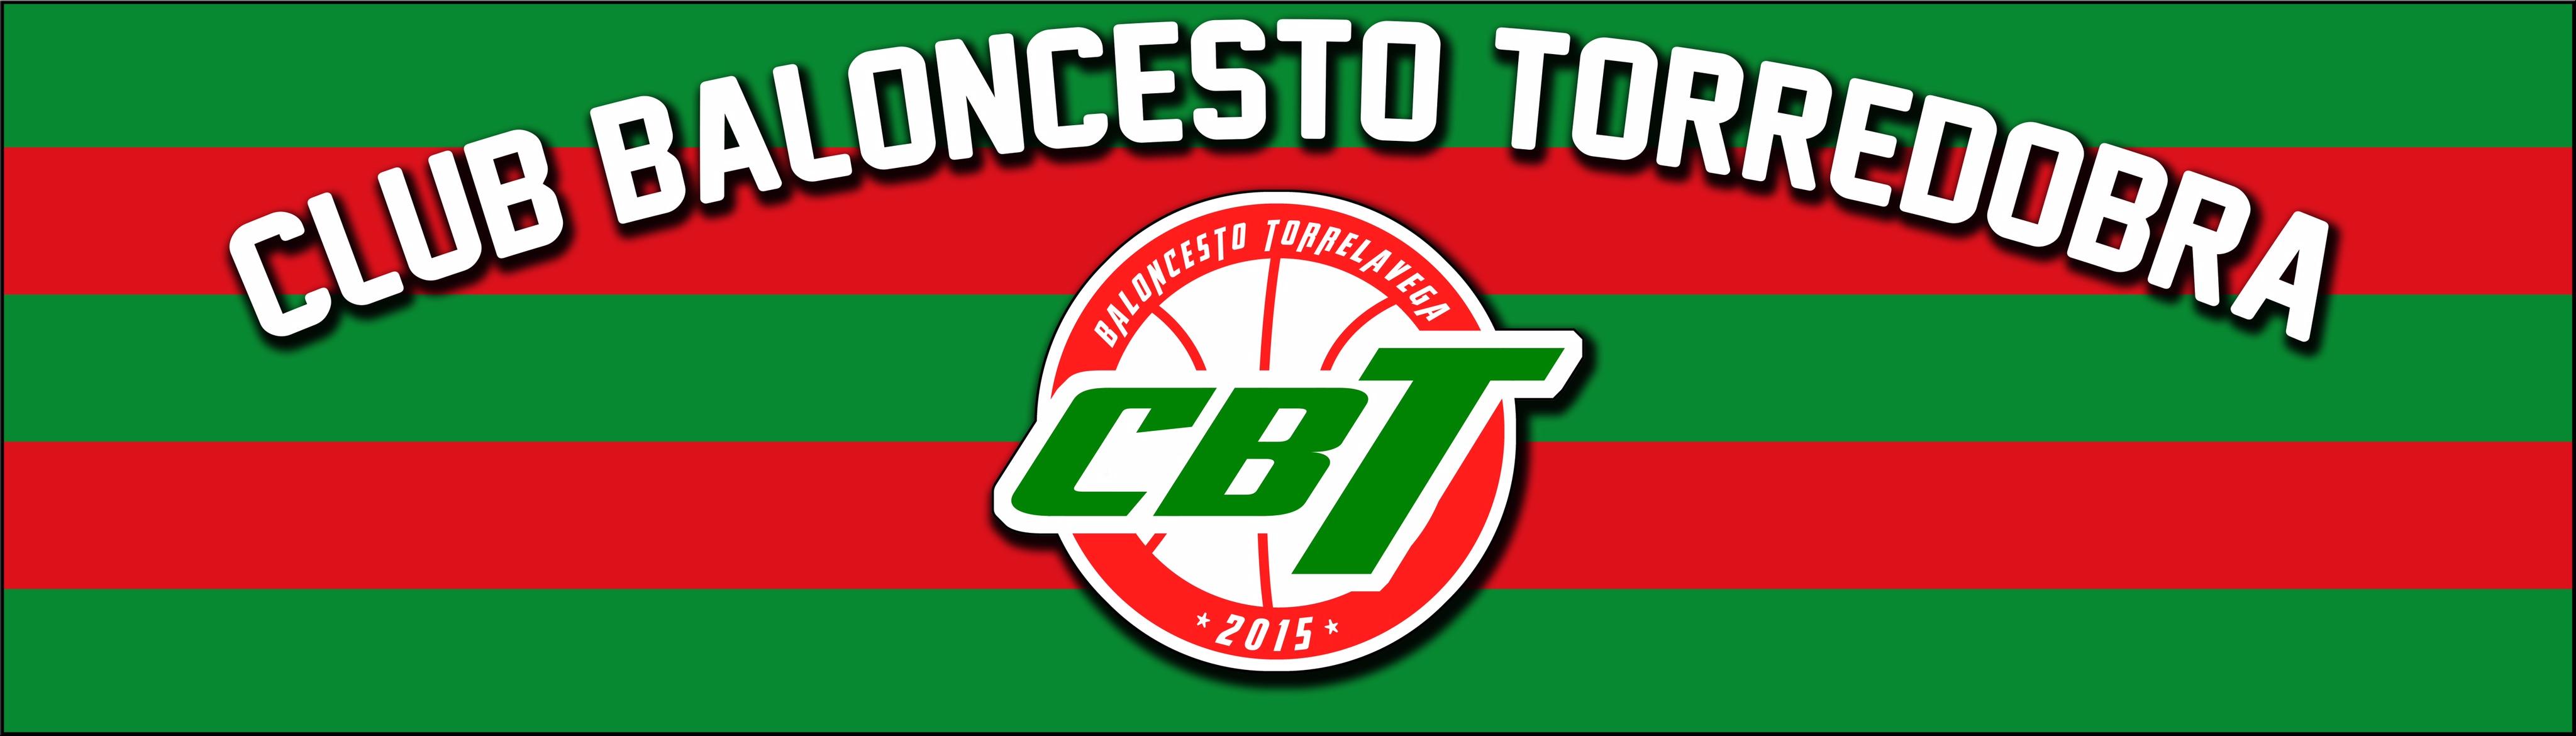 CDB Baloncesto Torredobra